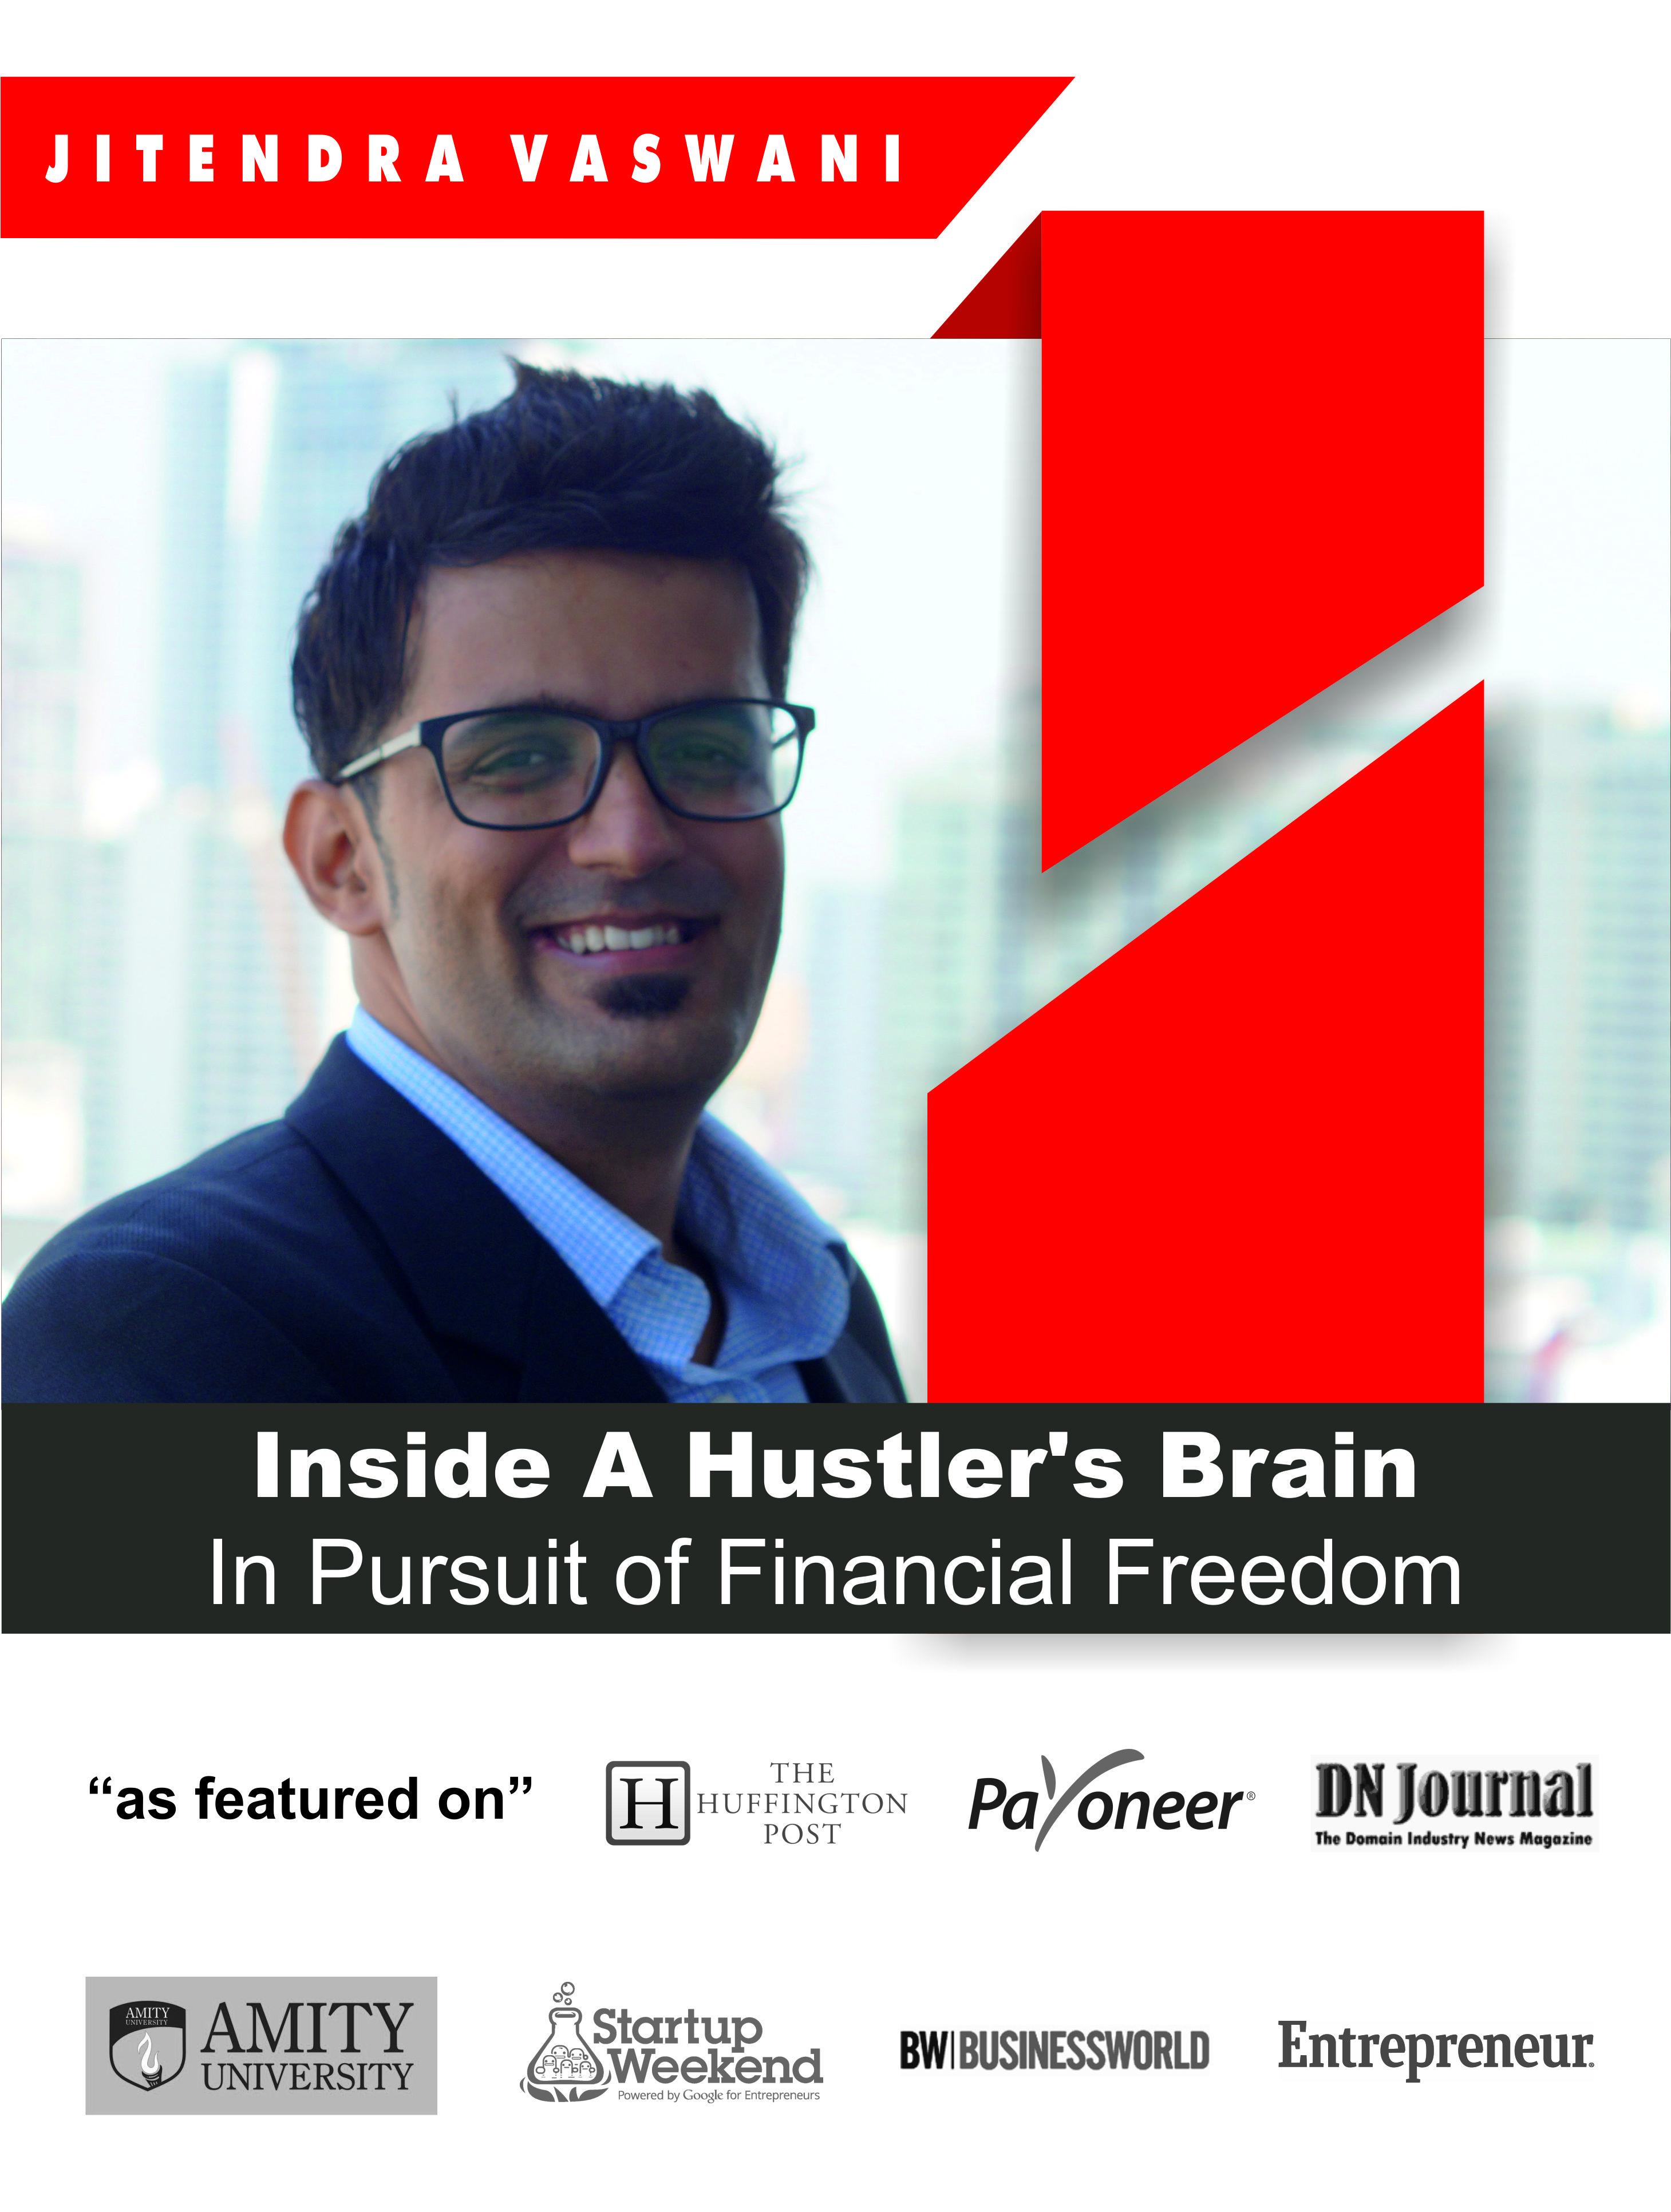 jitendra-vaswani-book-front-cover